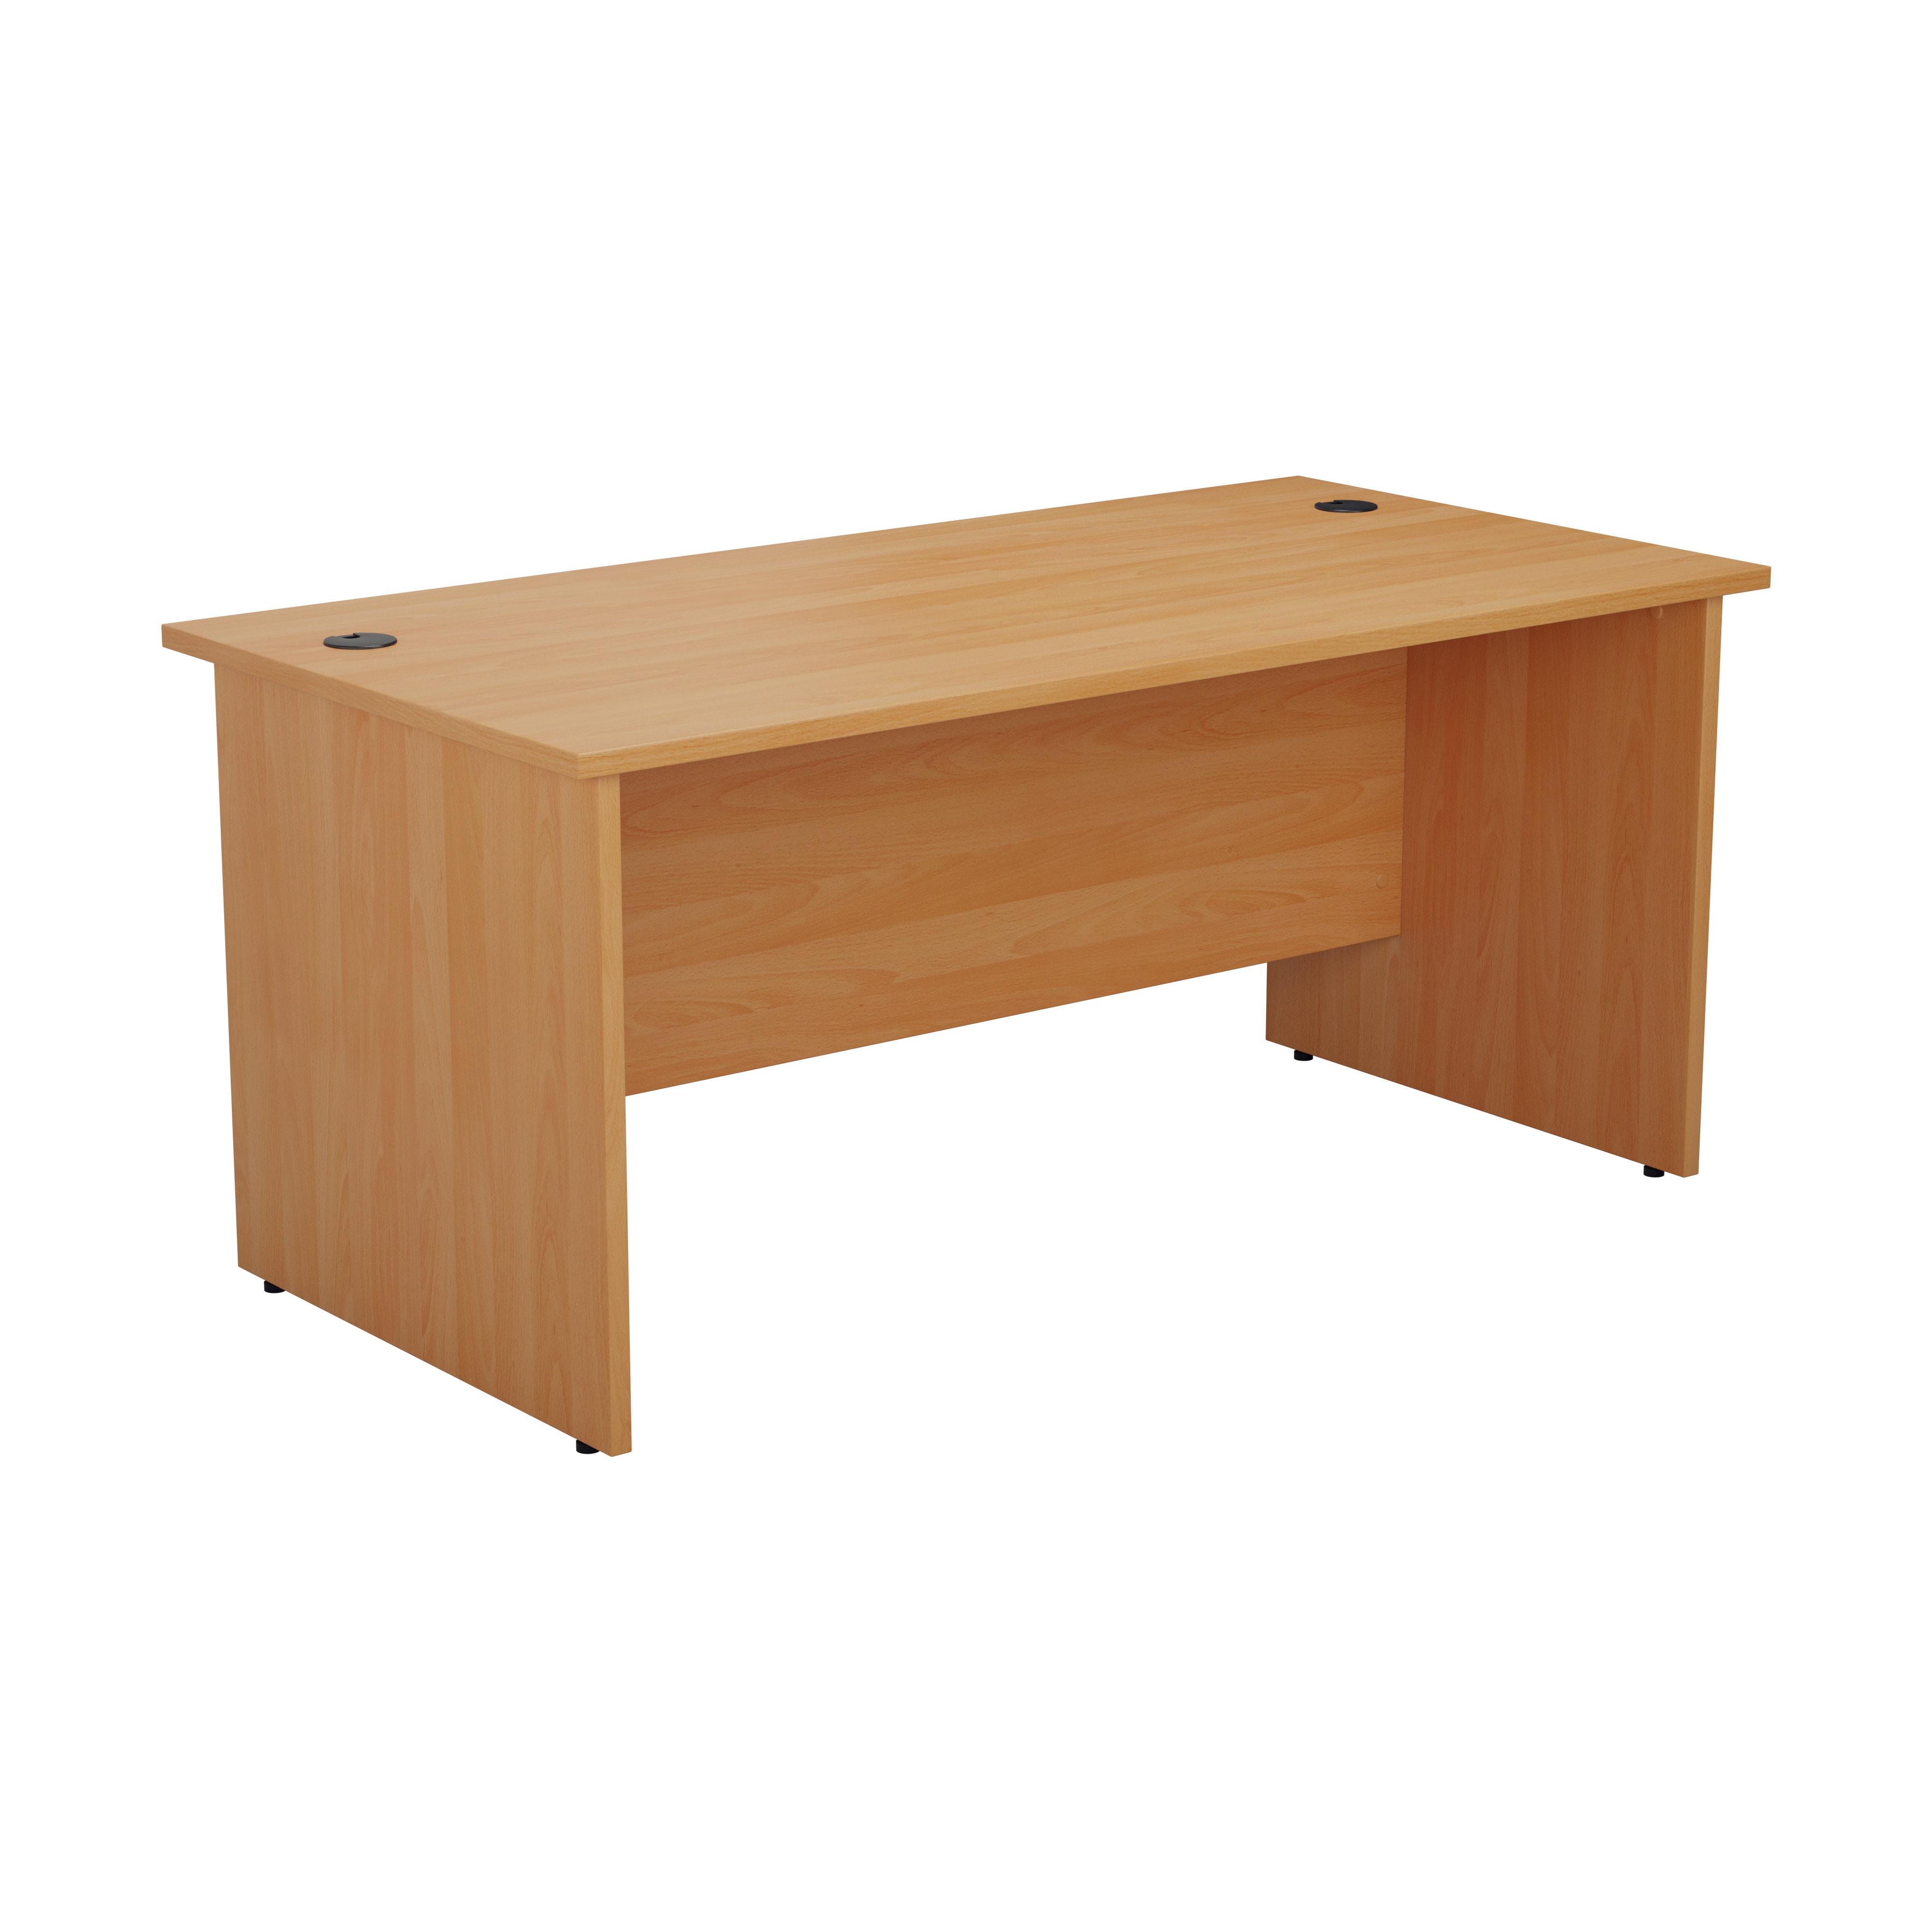 Essentials - 1600mm Panel End Rectangular Desk